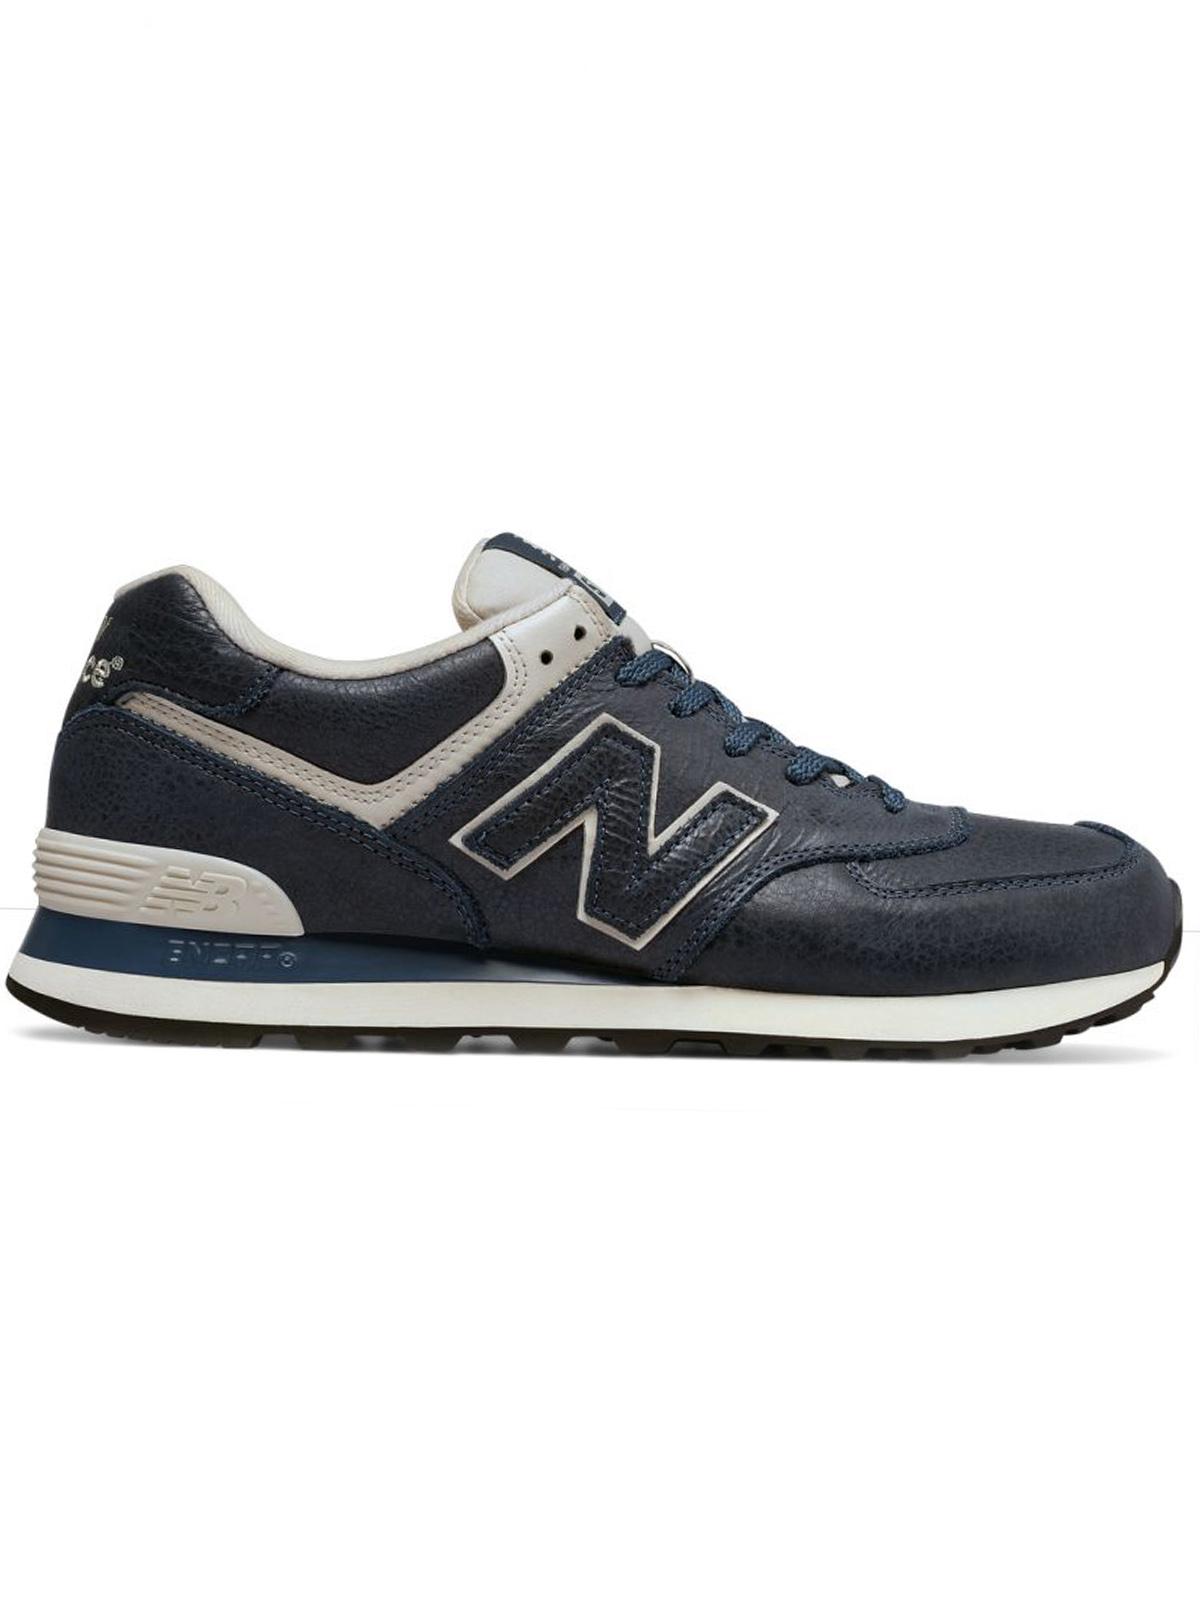 New Balance 574 NEW BALANCE   12   ML574LUB